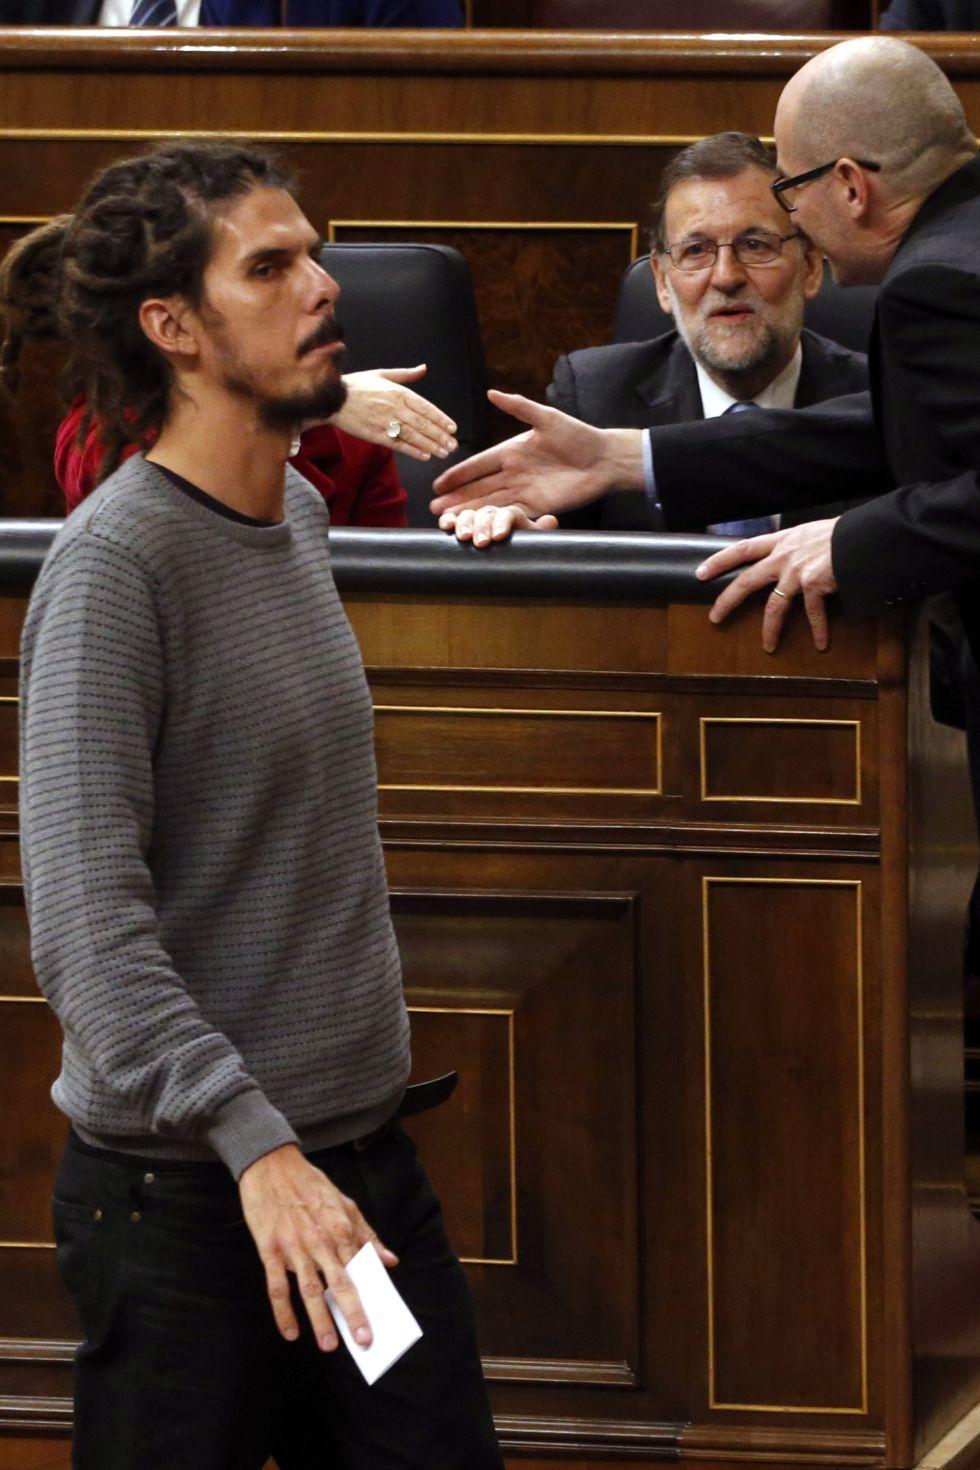 Mariano Rajoy und Alberto Rodríguez